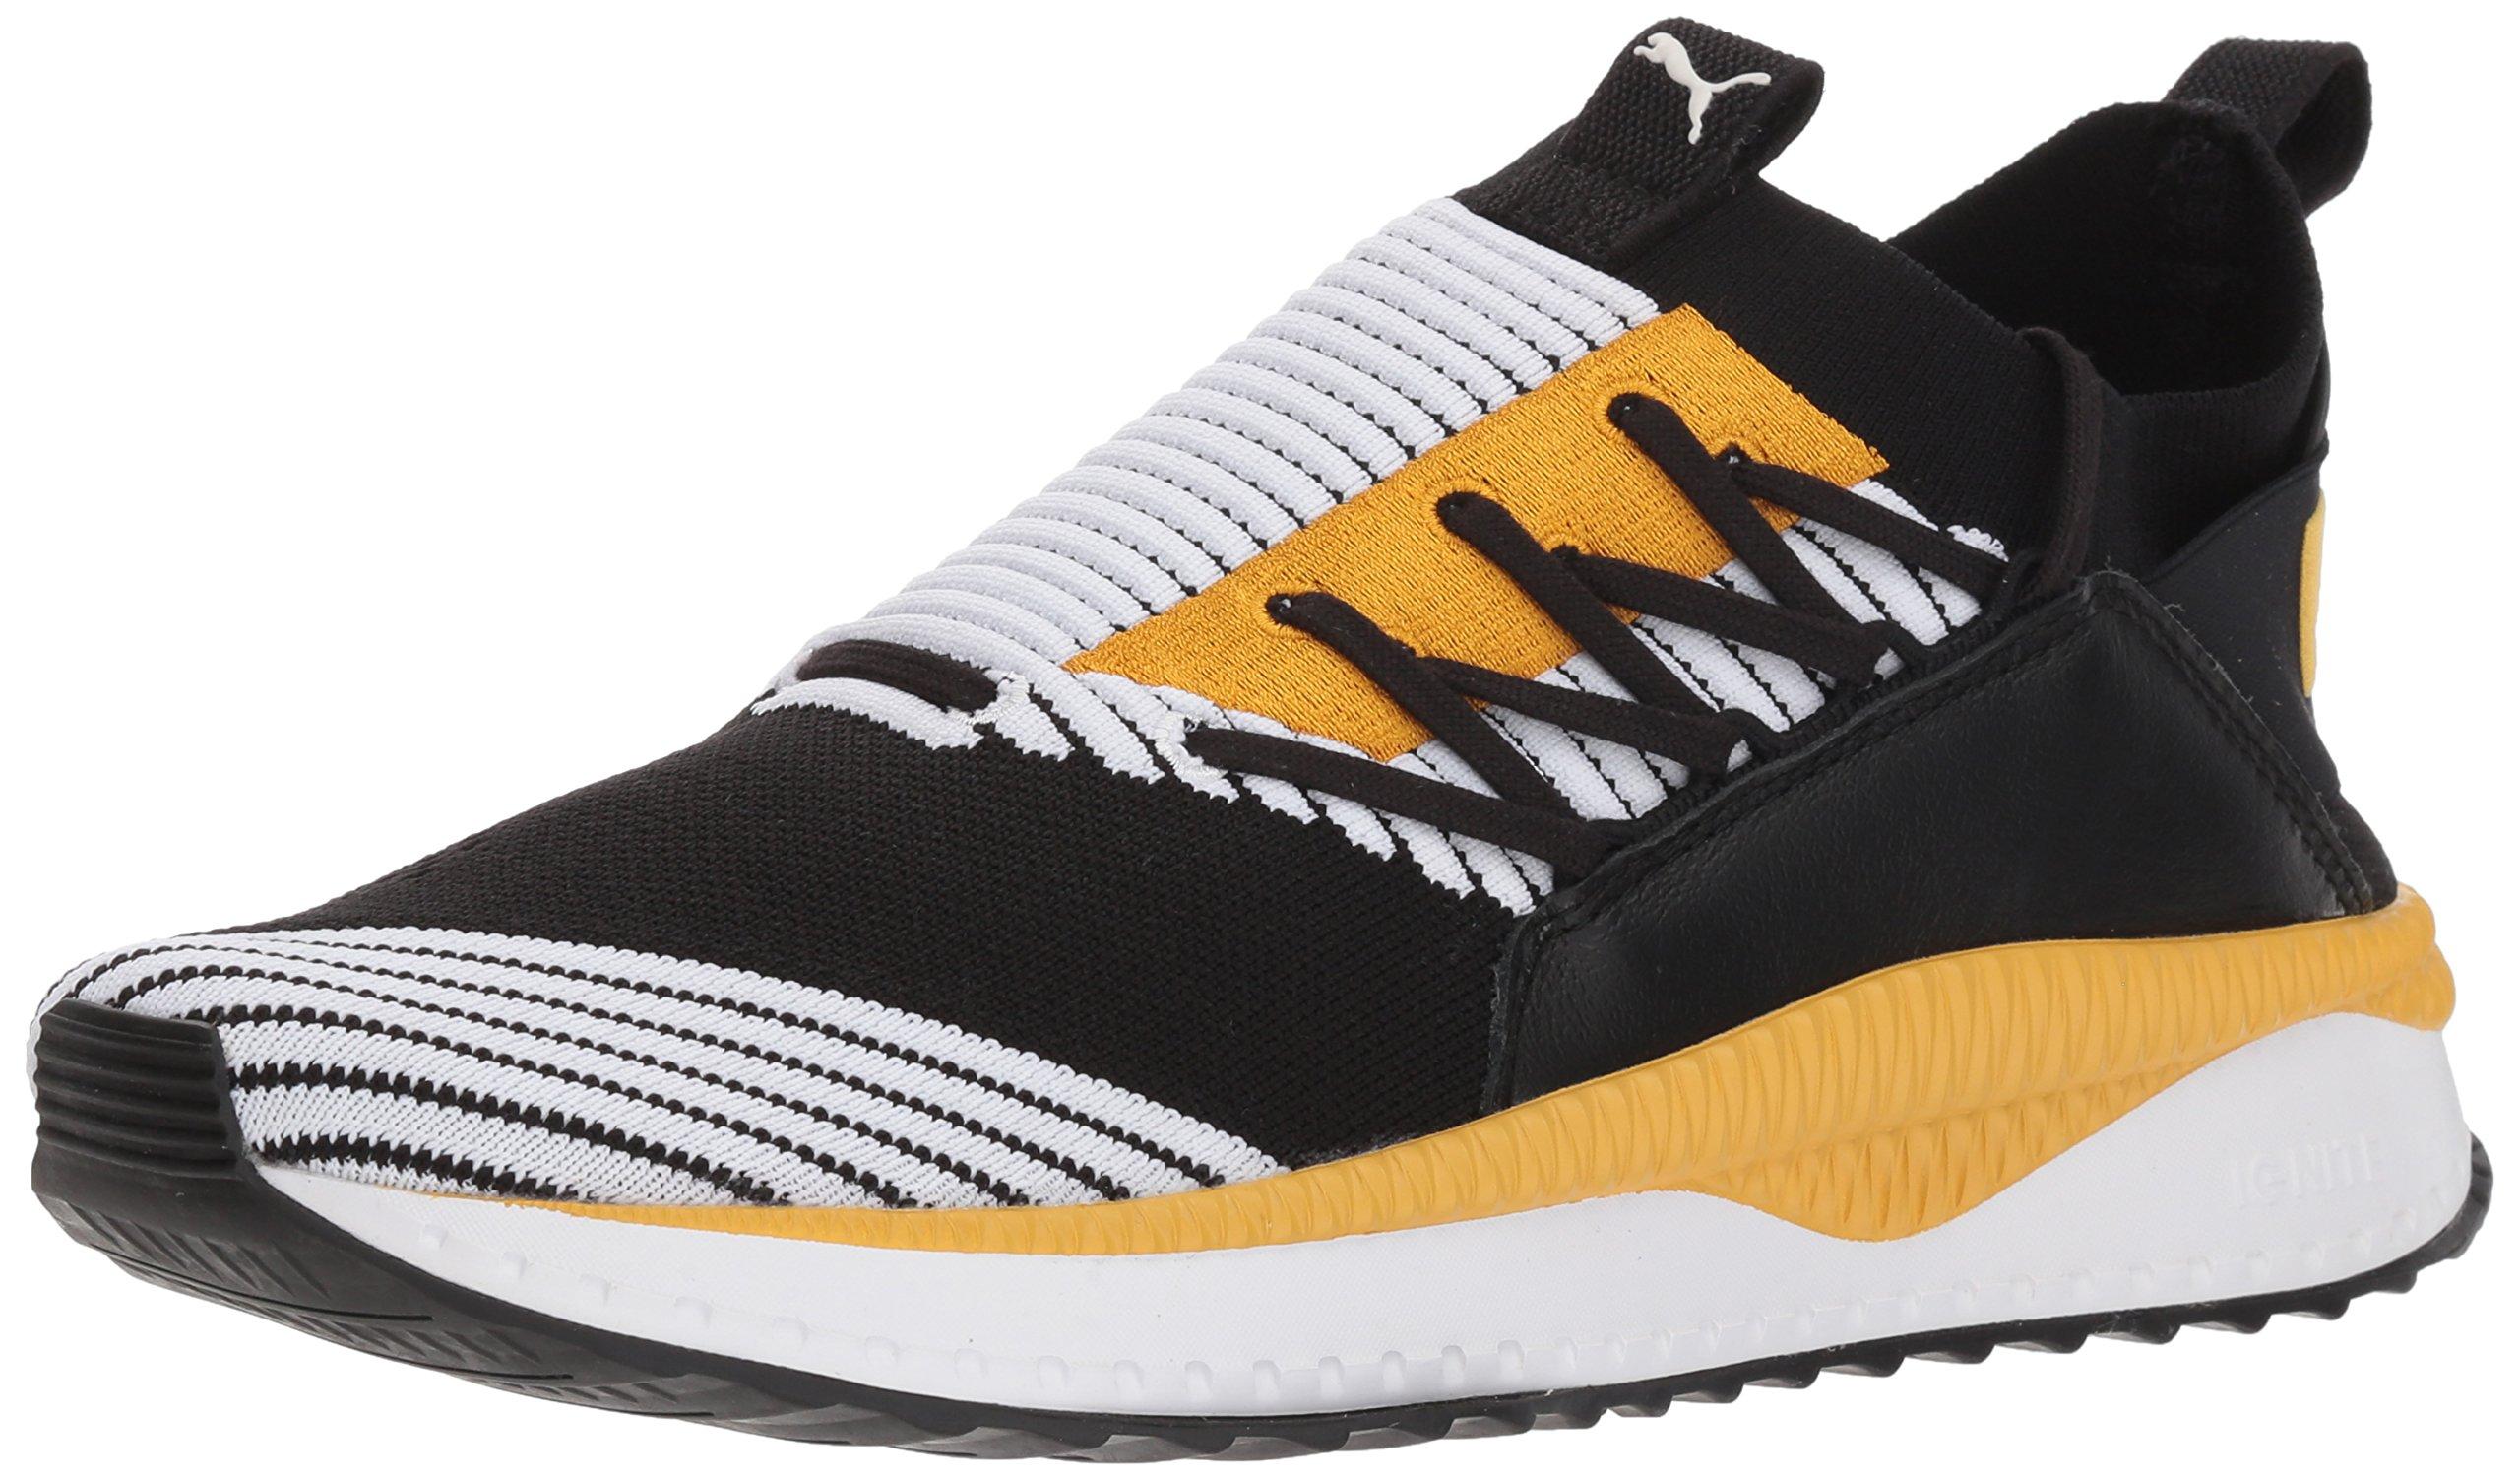 5732c1018e PUMA Men's Tsugi Jun Sneaker, Black White-Mineral Yellow, 10 M US